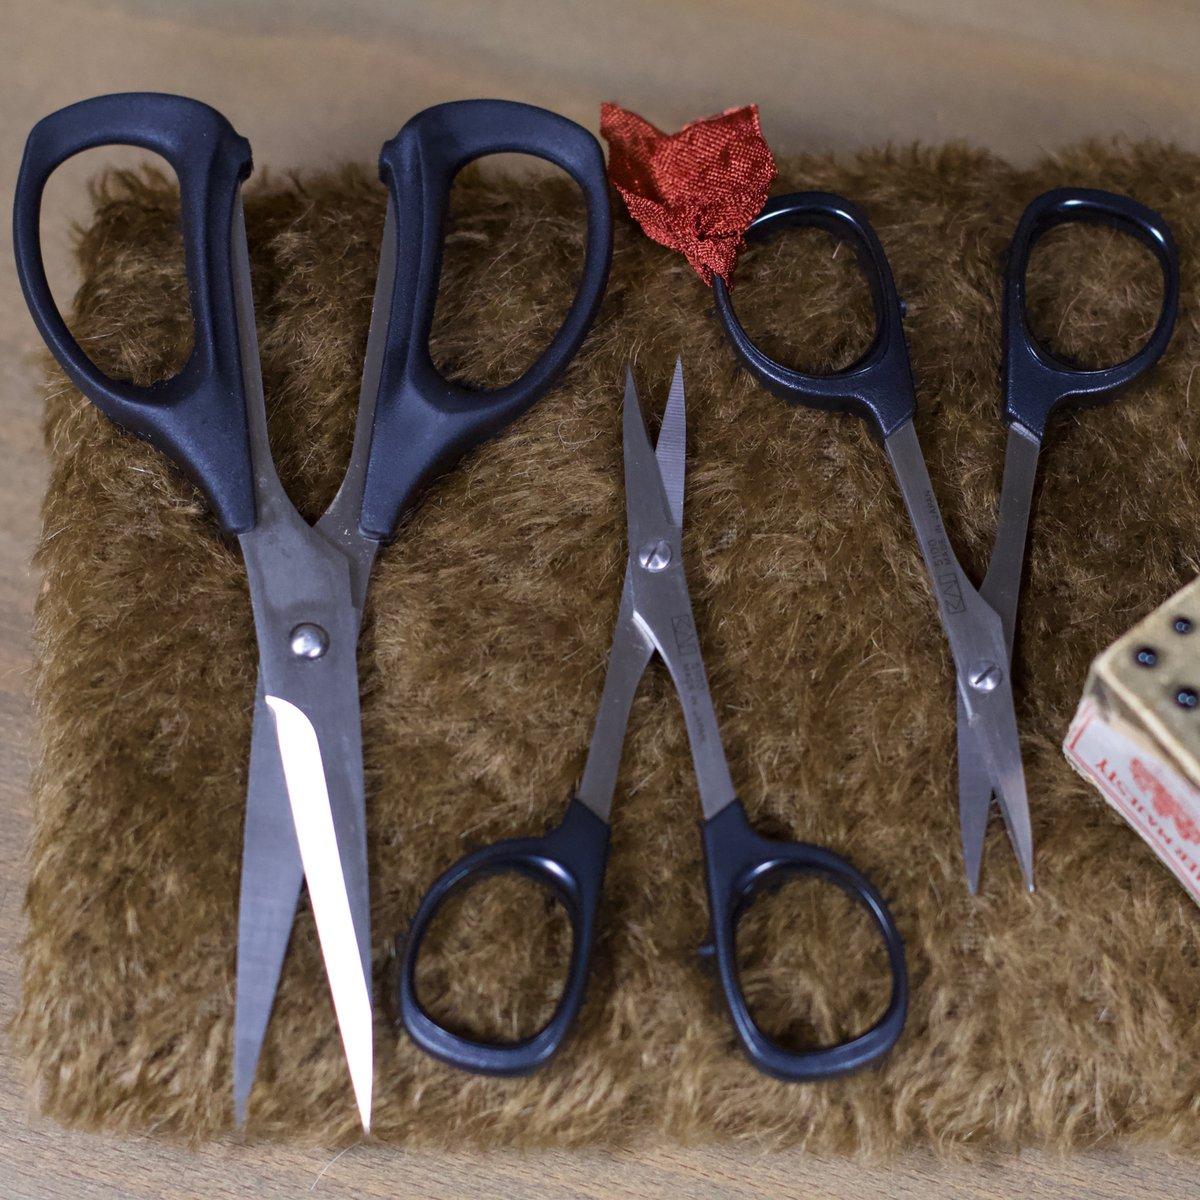 Image of My Favorite Sewing Scissors ~ By: Kai of Japan ~ 3 pair